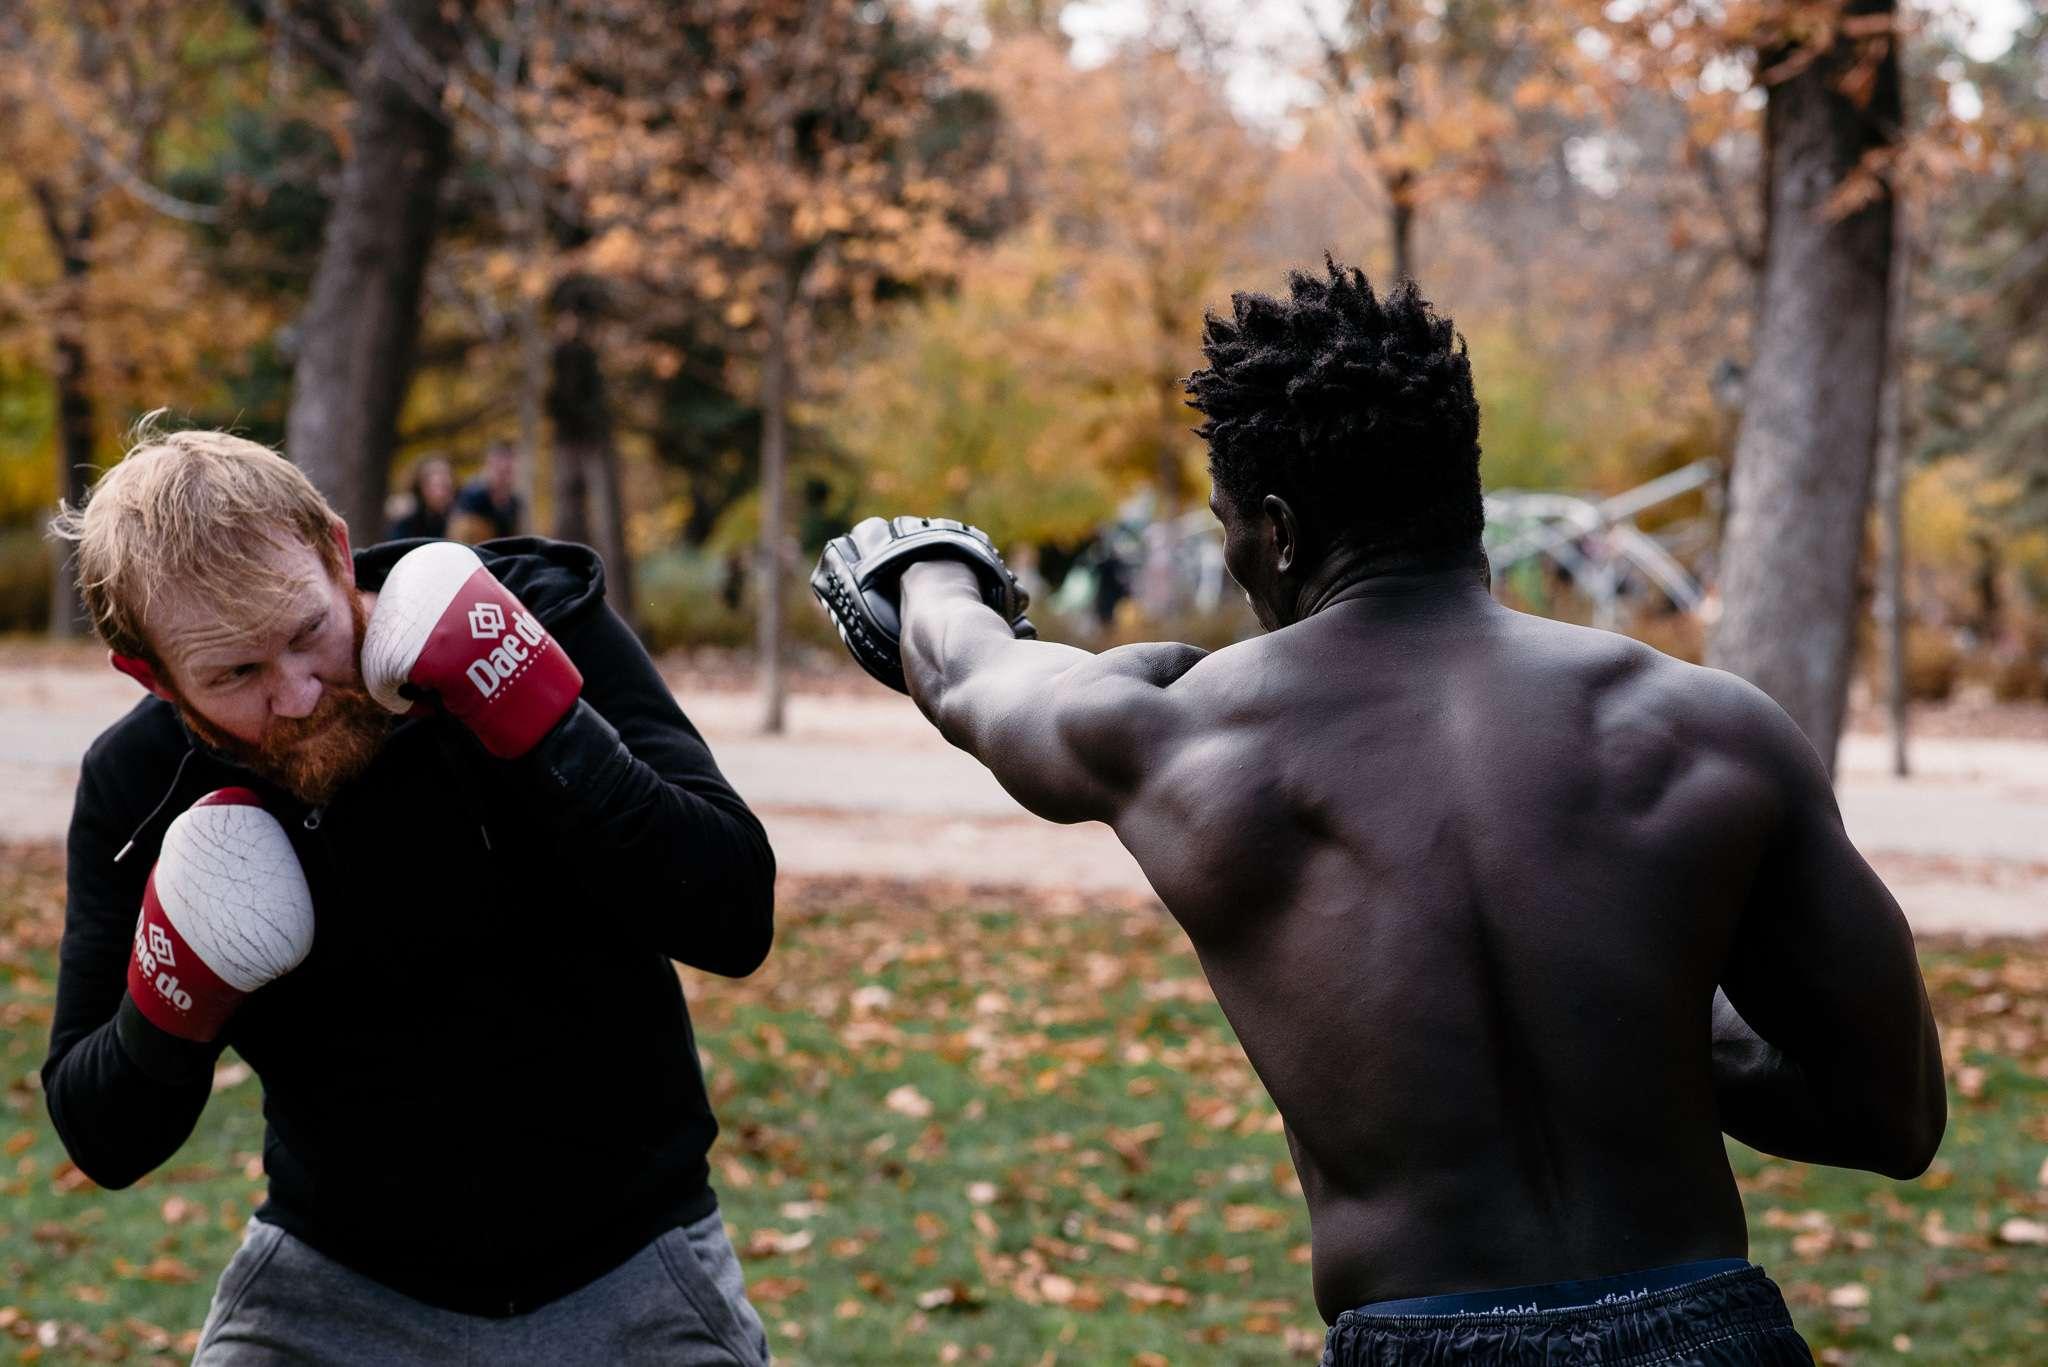 boxeo en parque retiro en inglés